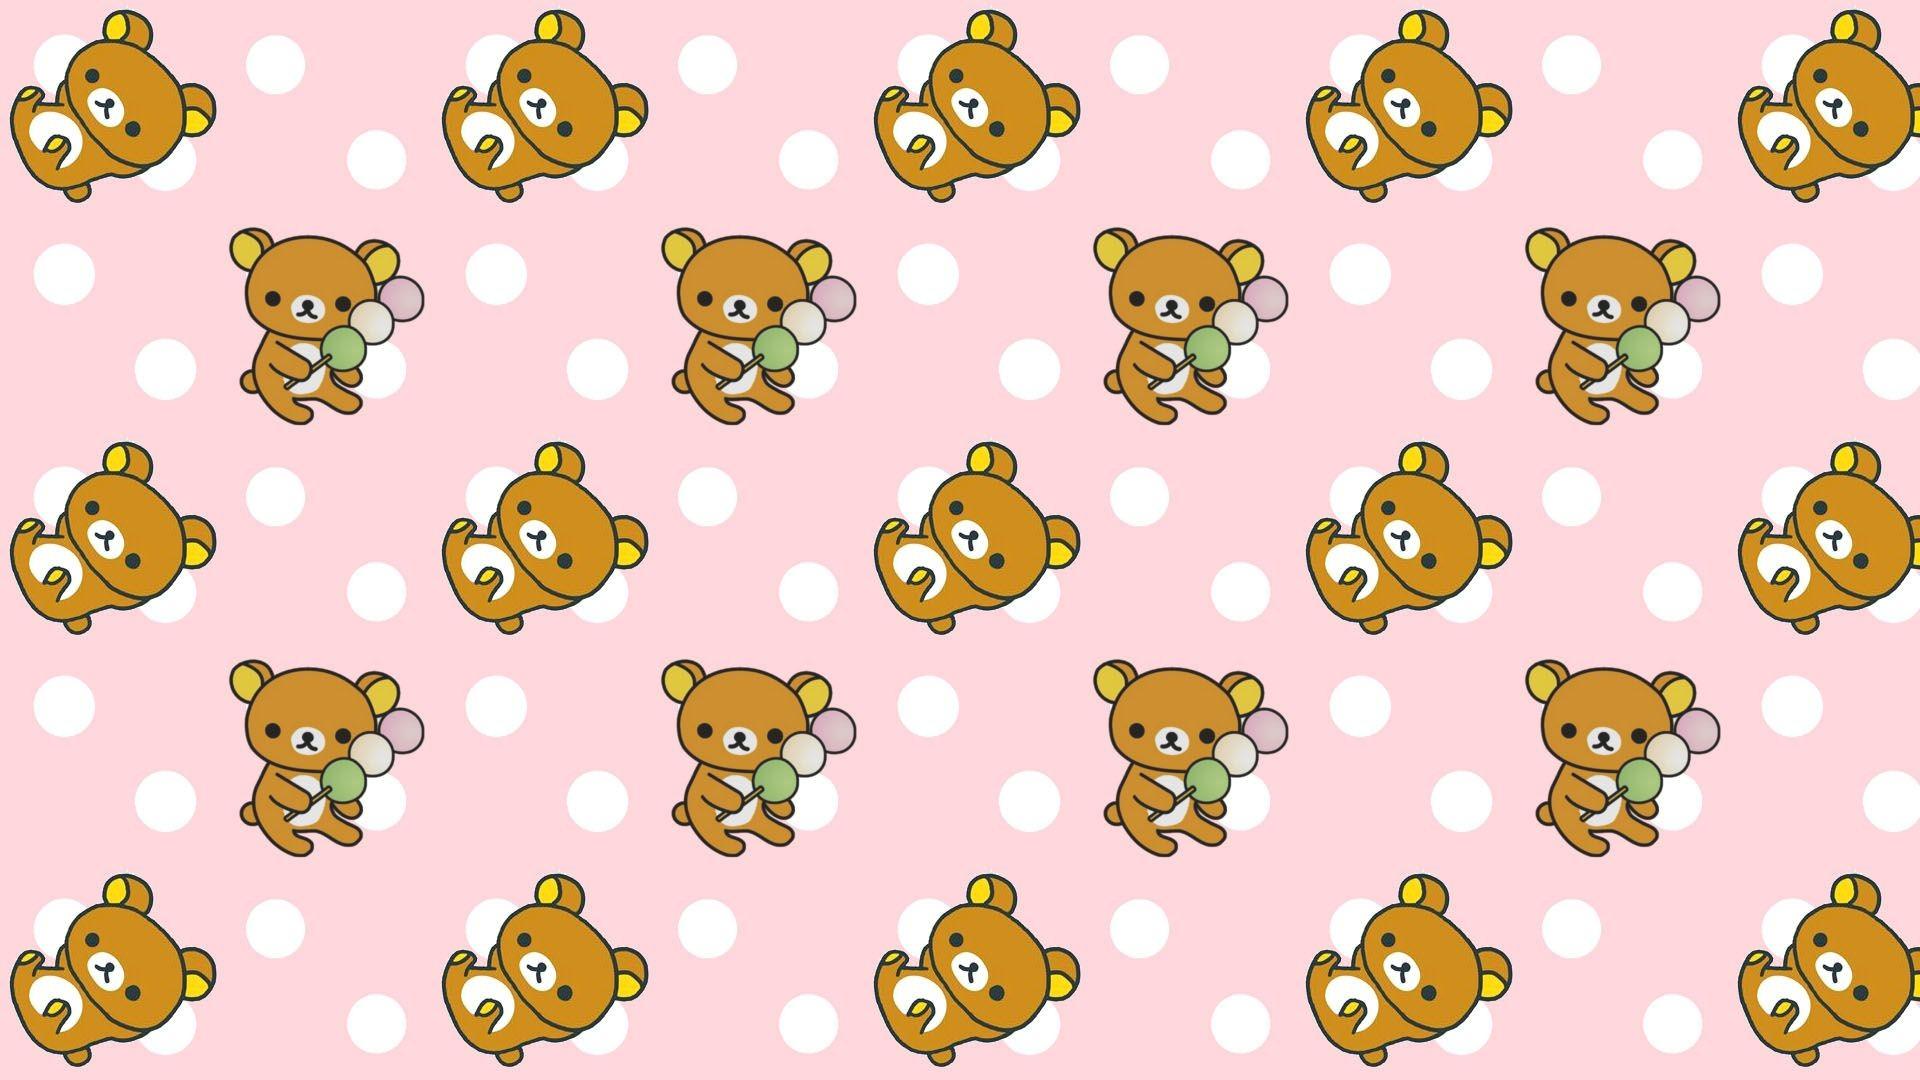 Res: 1920x1080, d Love Couple Cartoon Wallpapers Download d wallpaper HD